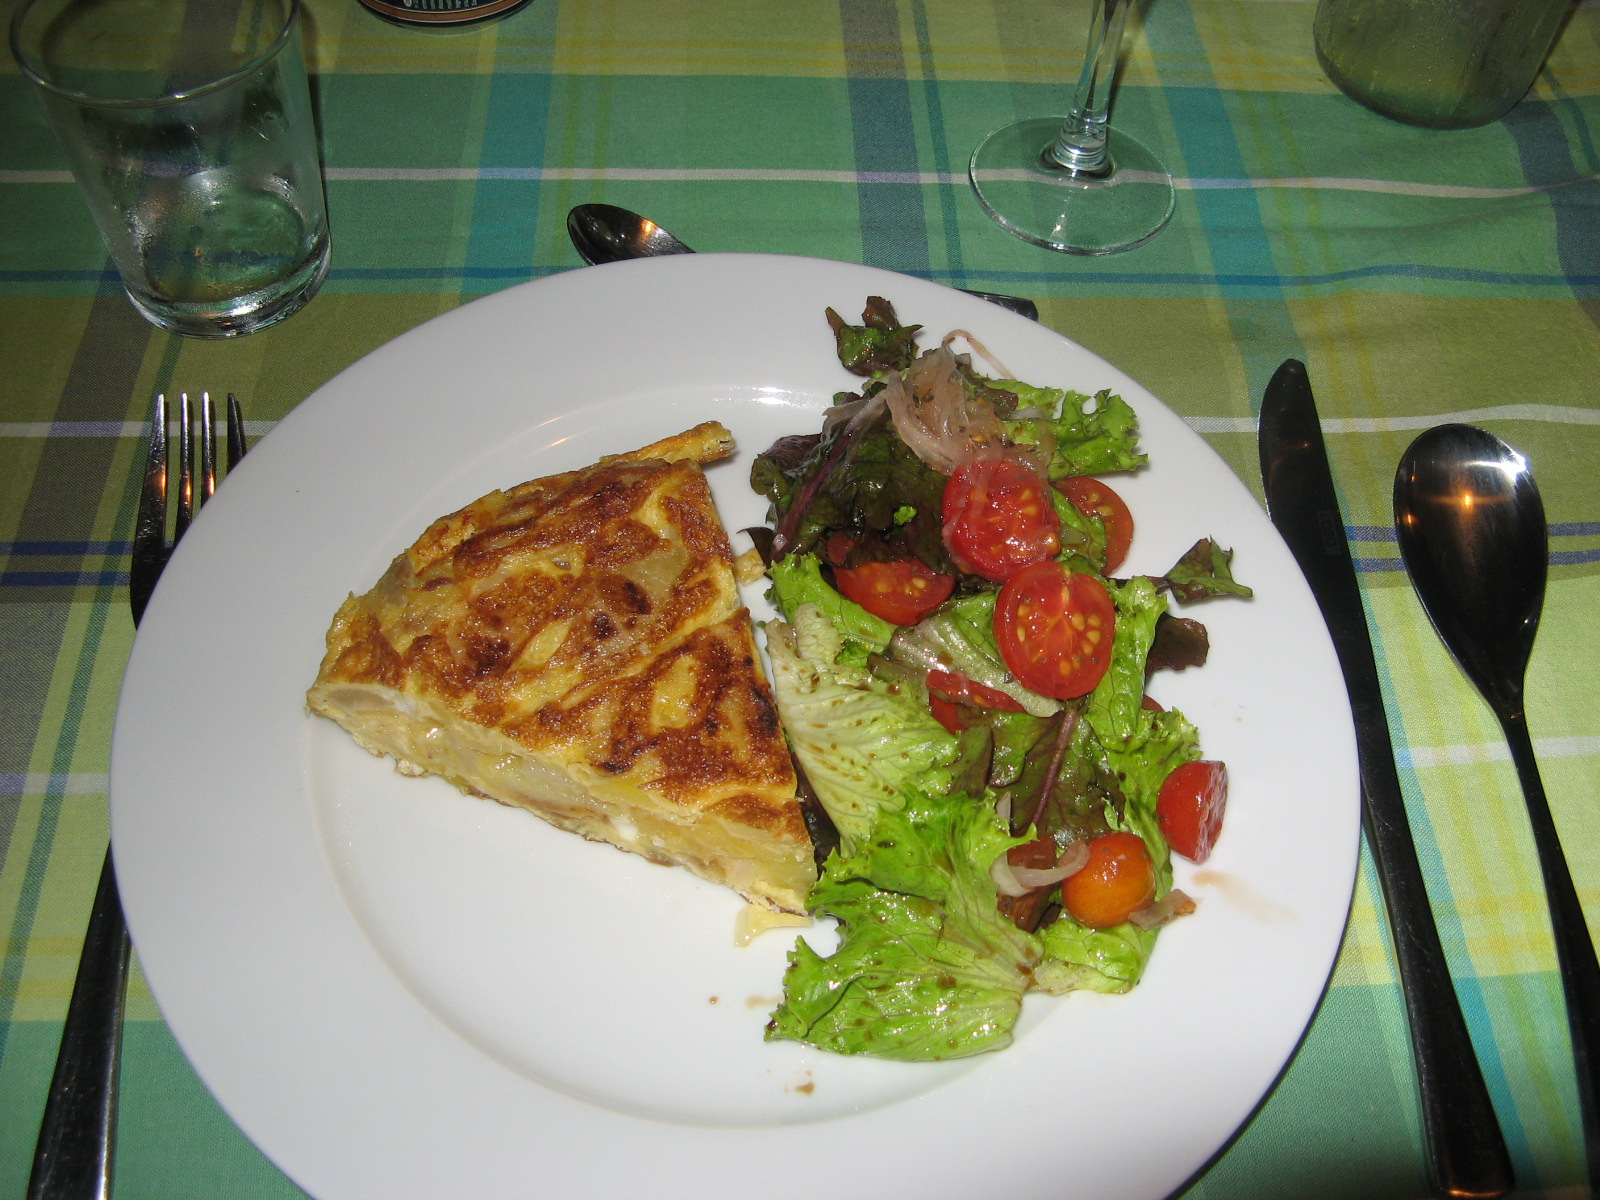 April 39 s passport asturias part iv the food at the b b for Asturias cuisine